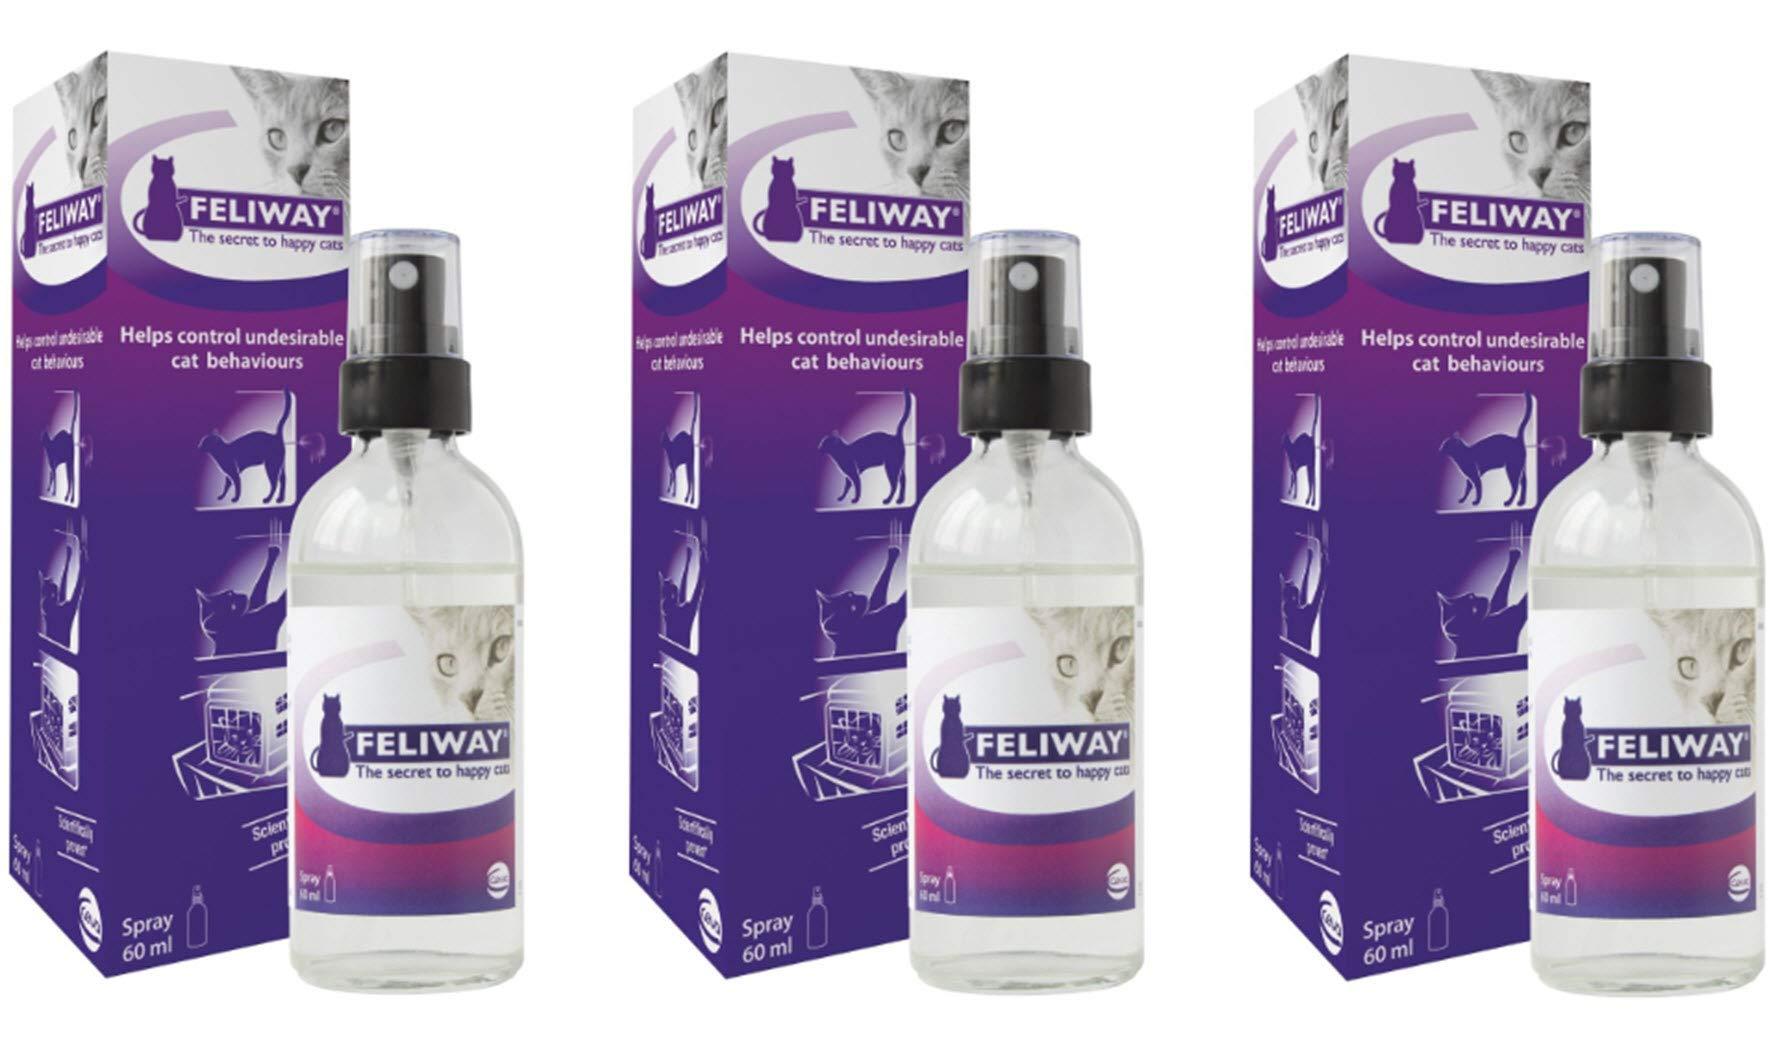 Feliway Spray 60 ml Cat Feline Stress Behavior Relief Urine Spraying Scratching (3-Pack)